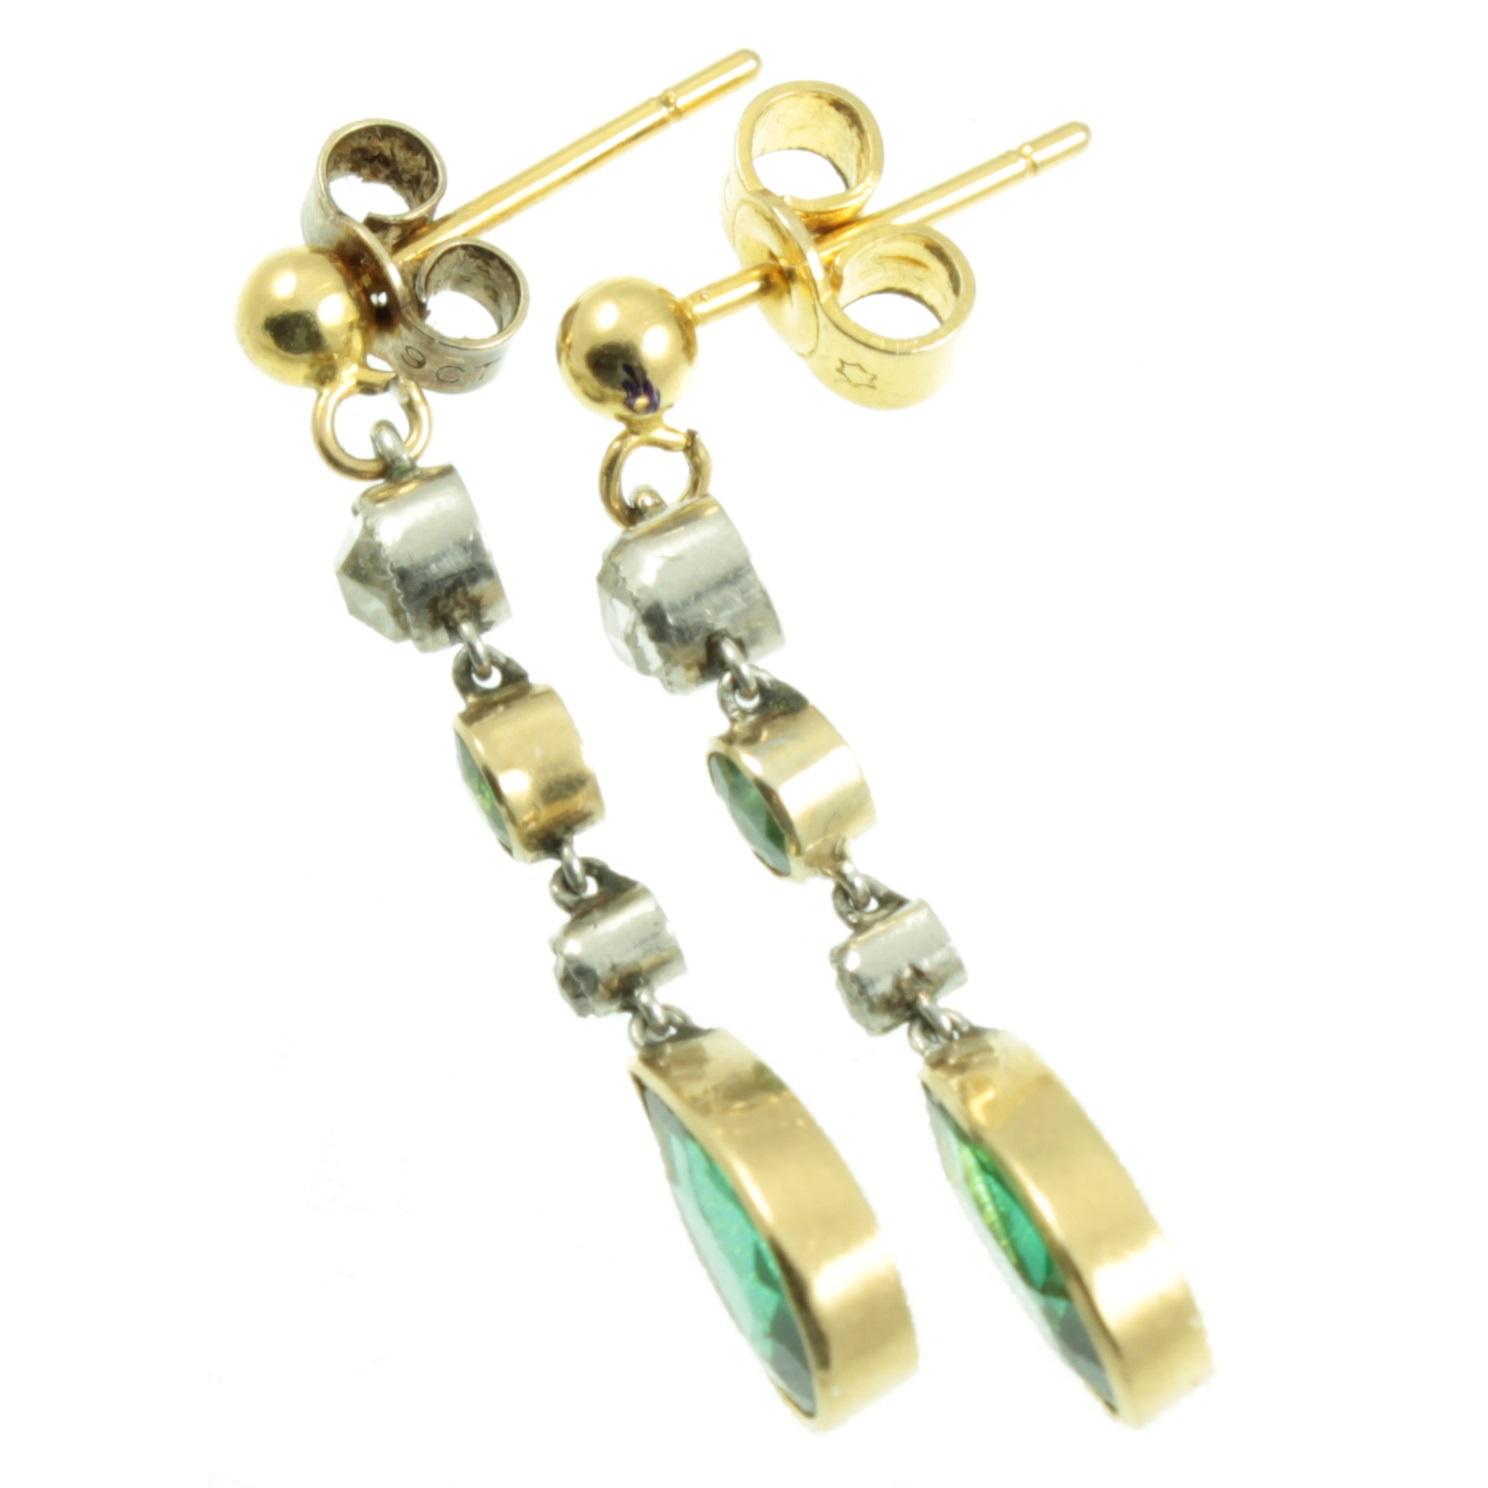 Edwardian Diamond and paste earrings